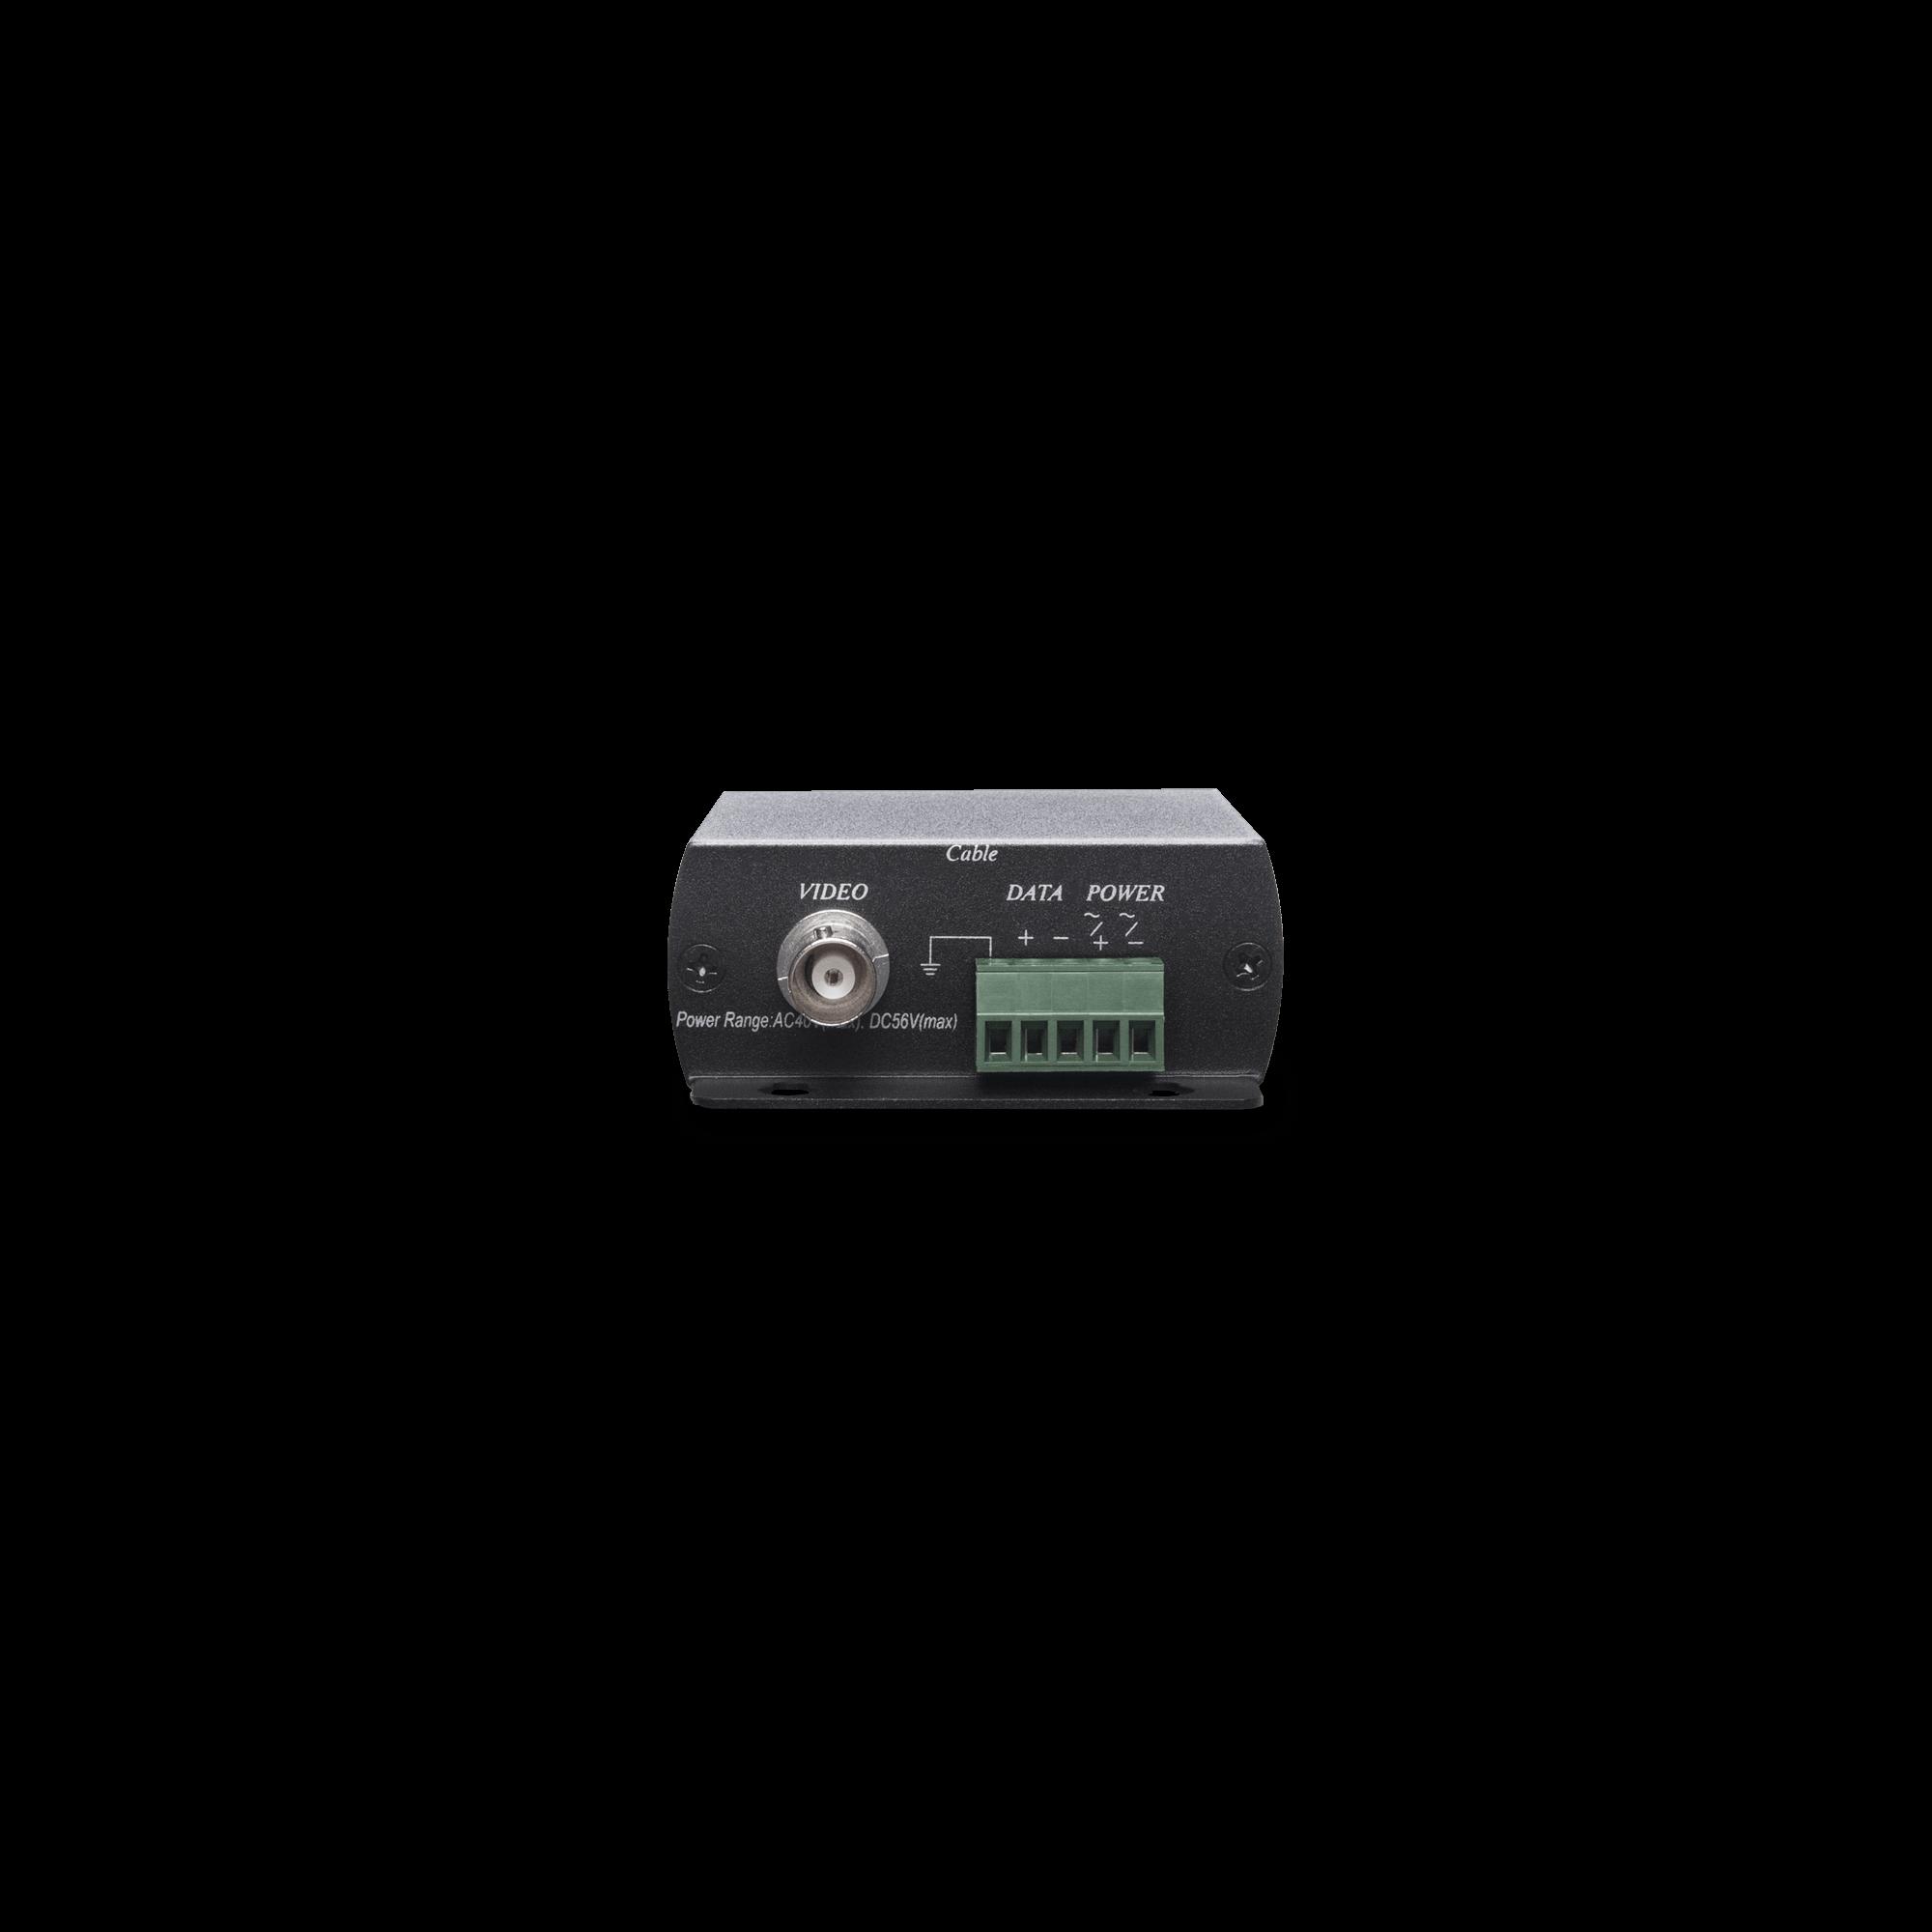 HD-TVI/AHD/HDCVI/CVBS & Power & Data Surge Protector